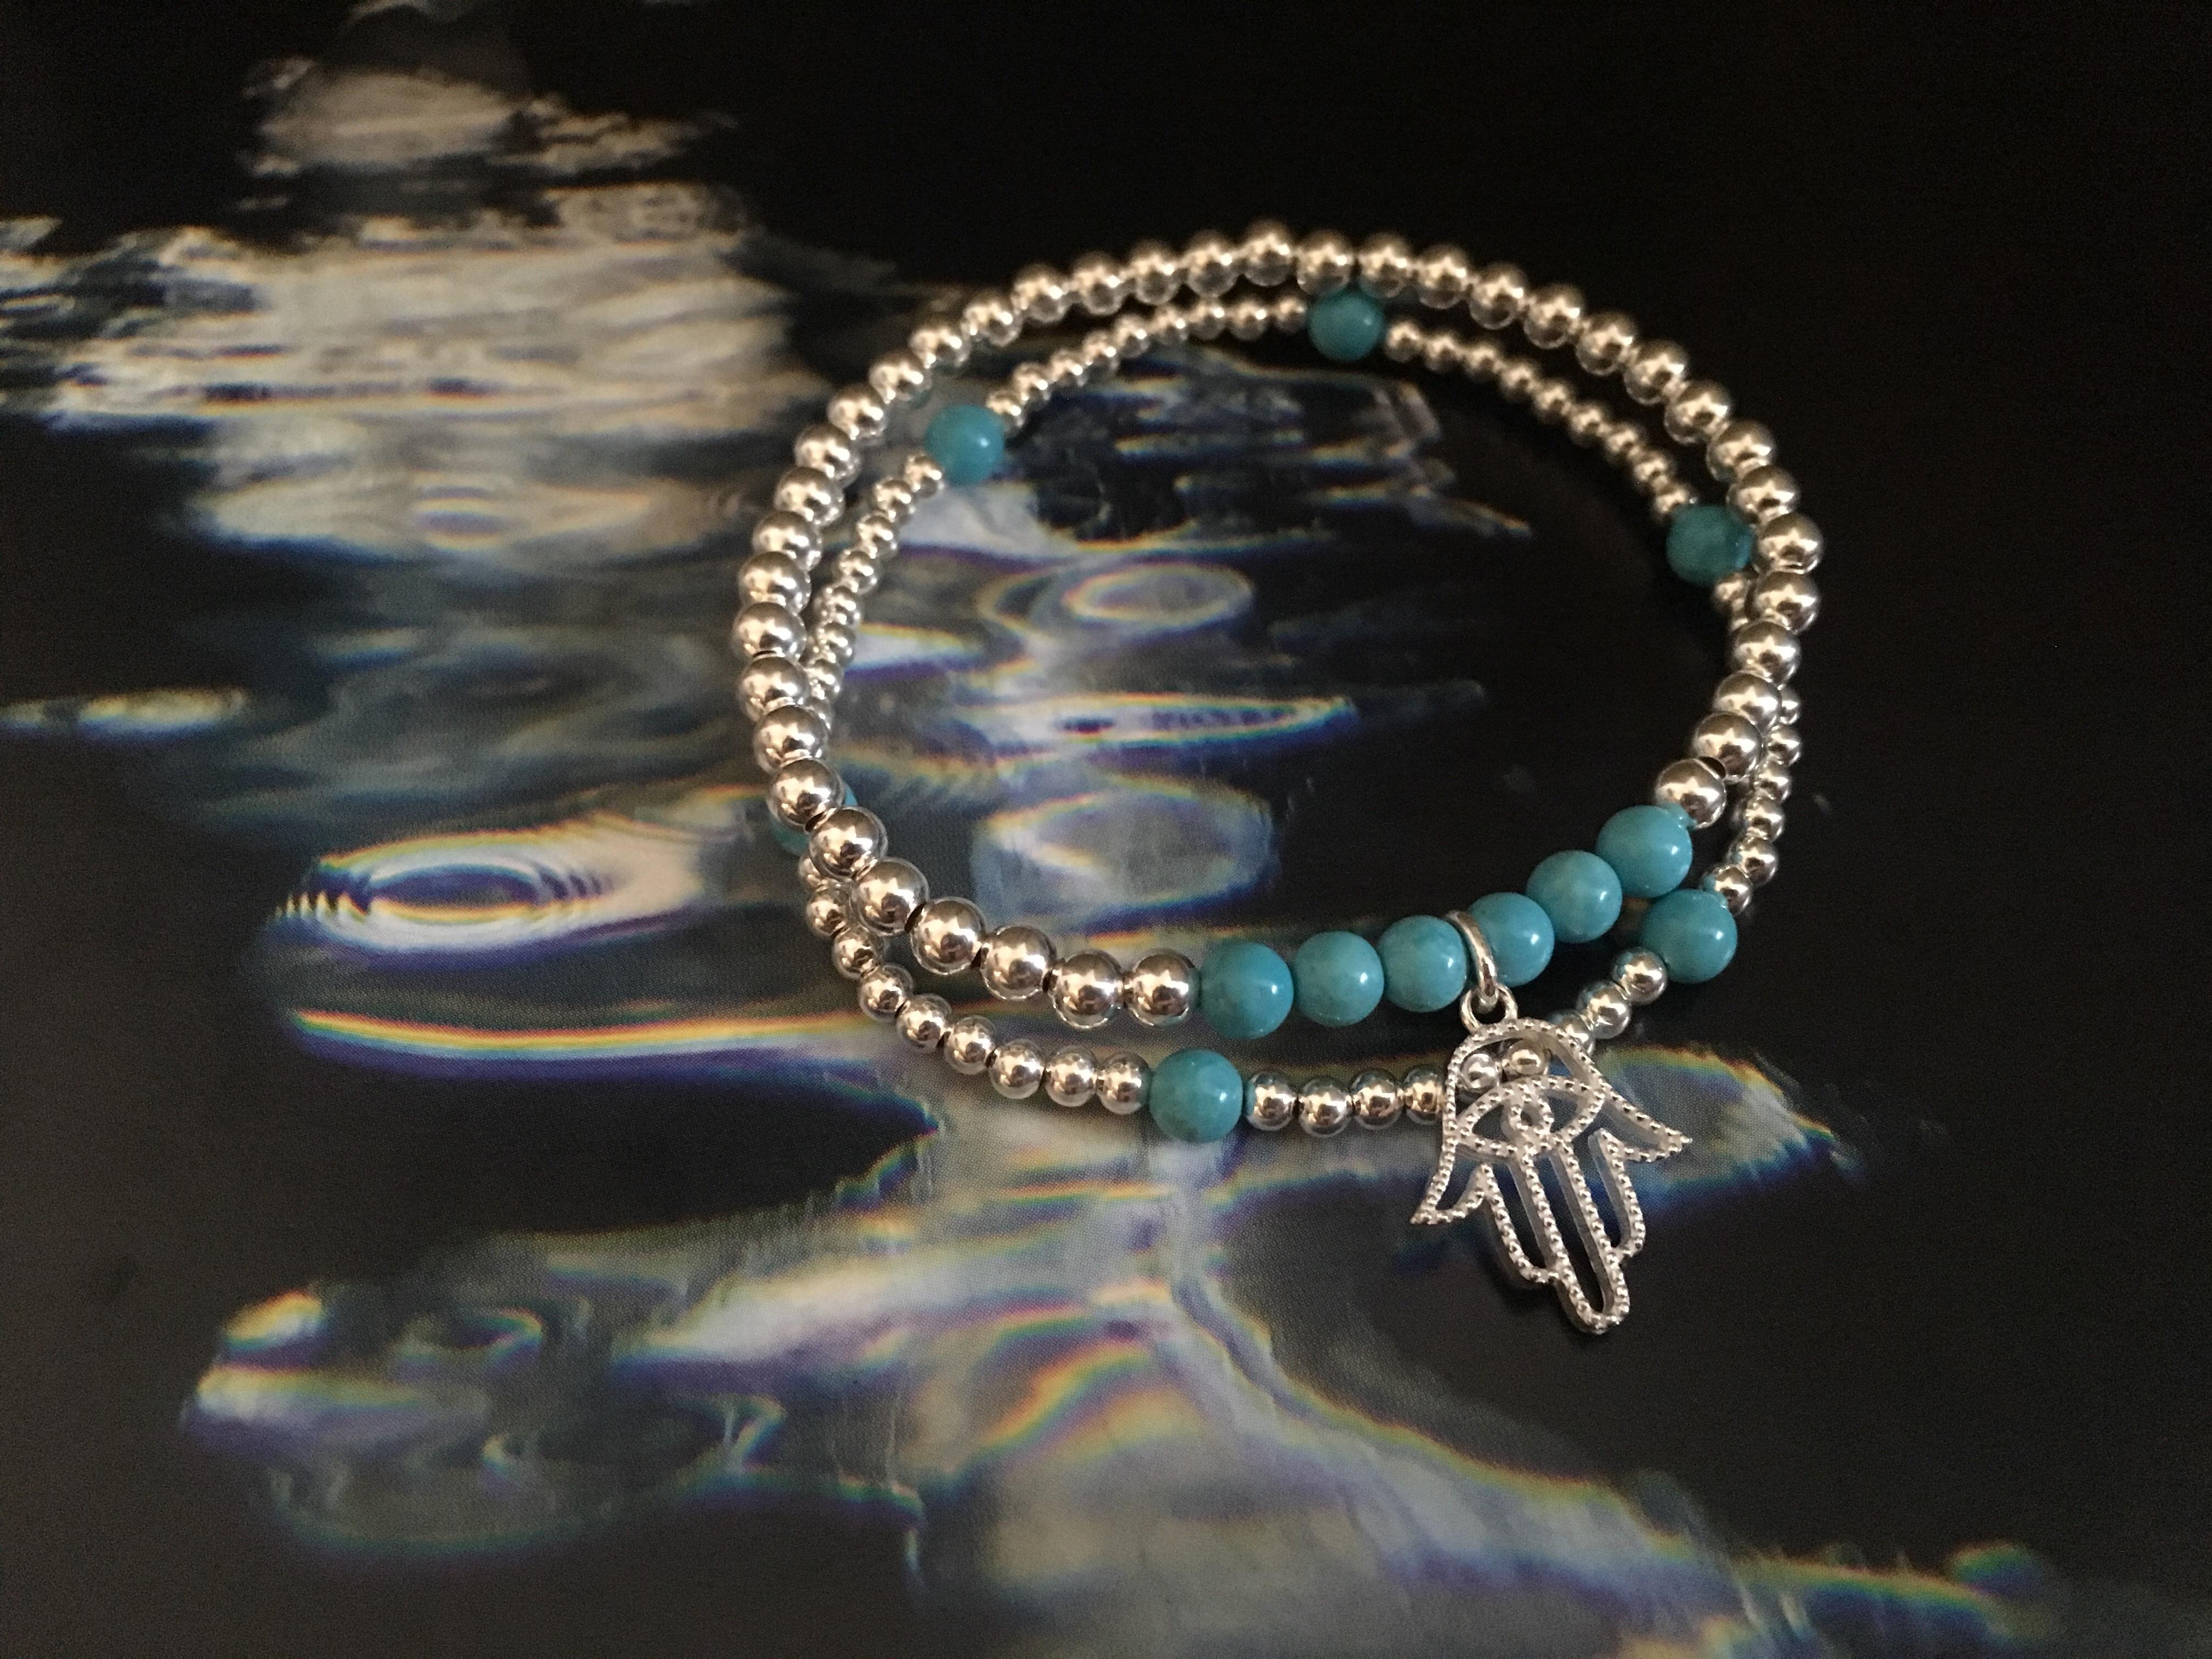 The stunning Turquoise stone